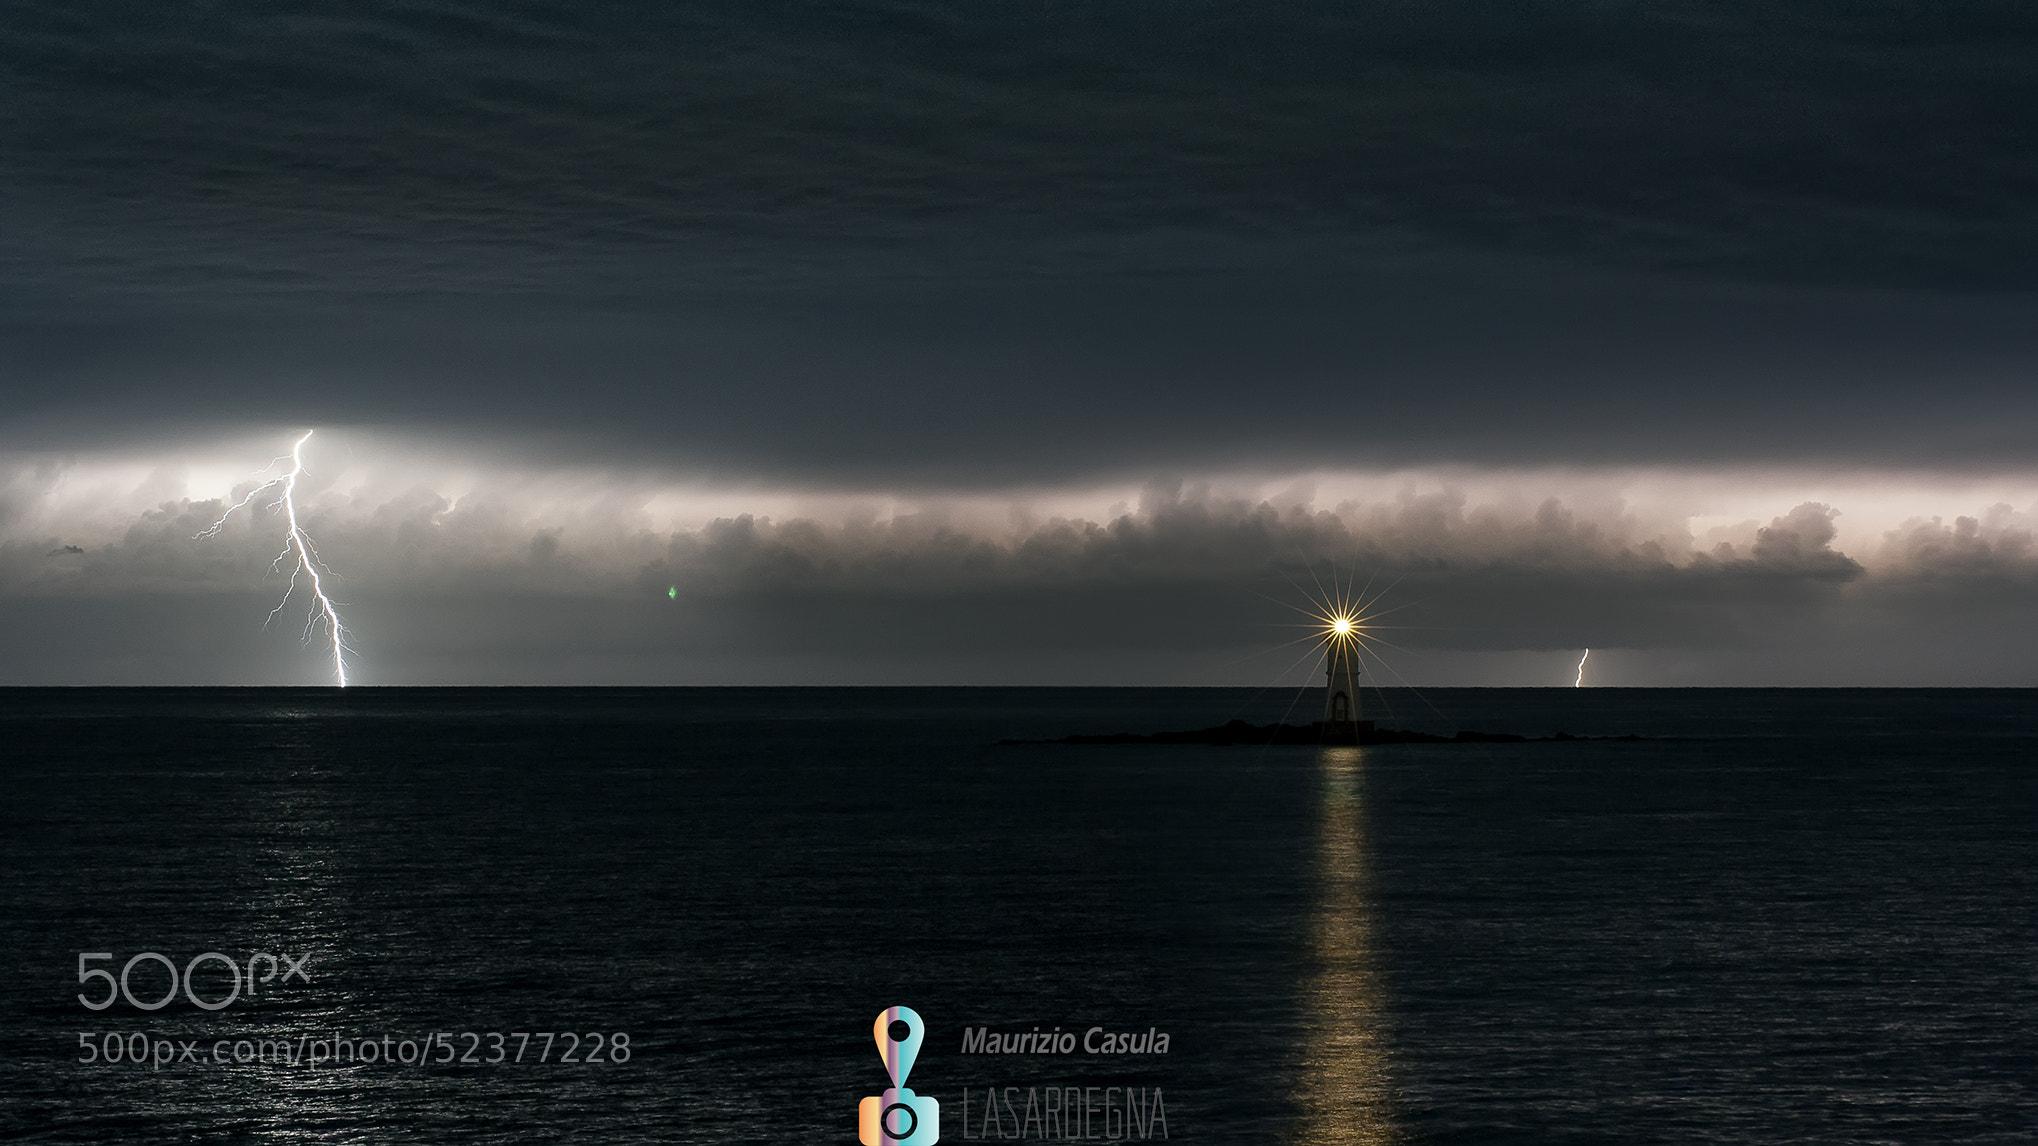 Photograph lighthouse mangiabarche & lightning by Maurizio Casula on 500px